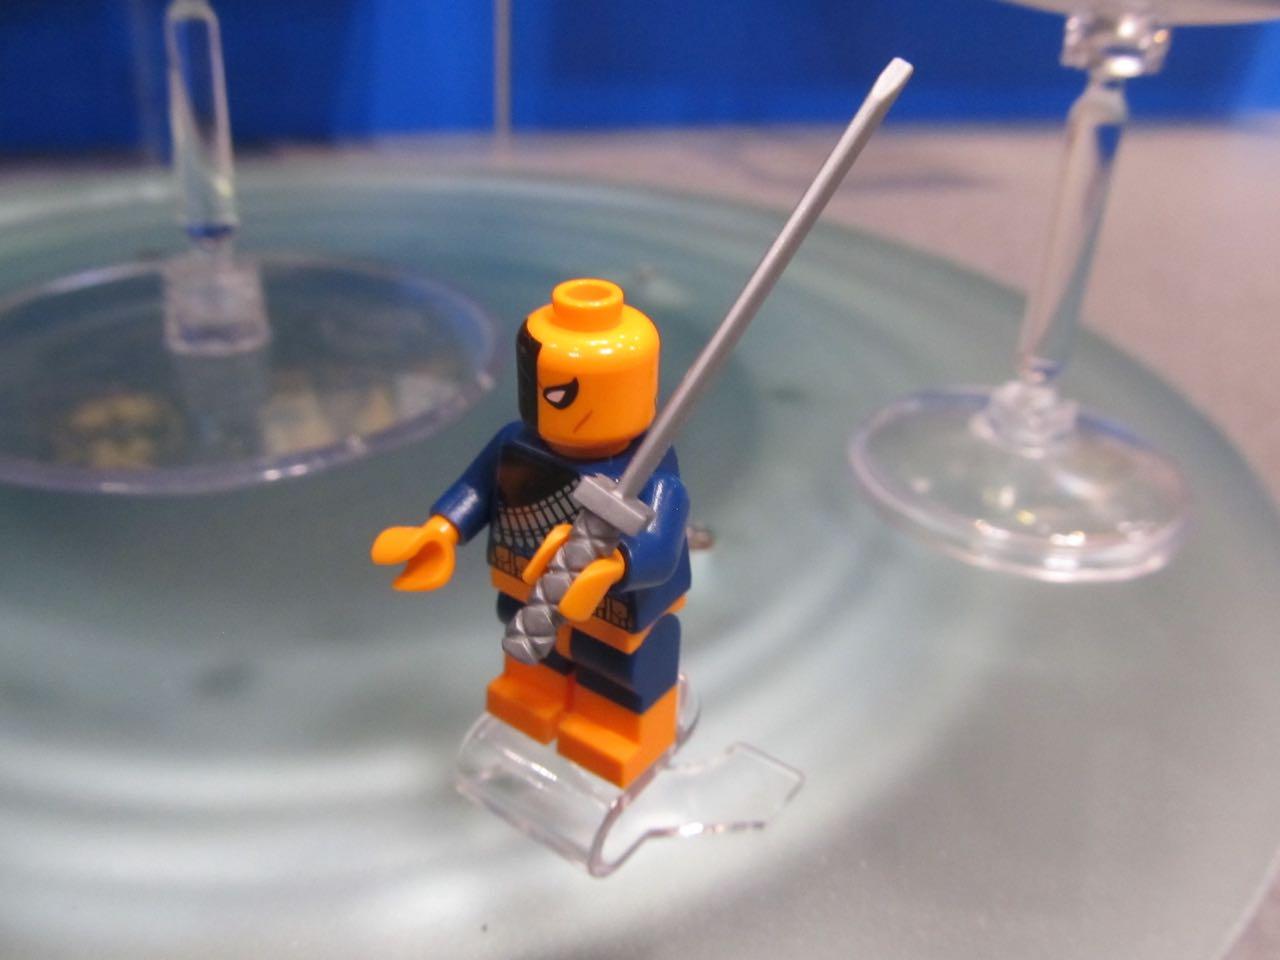 Lego Deathstroke mini figure